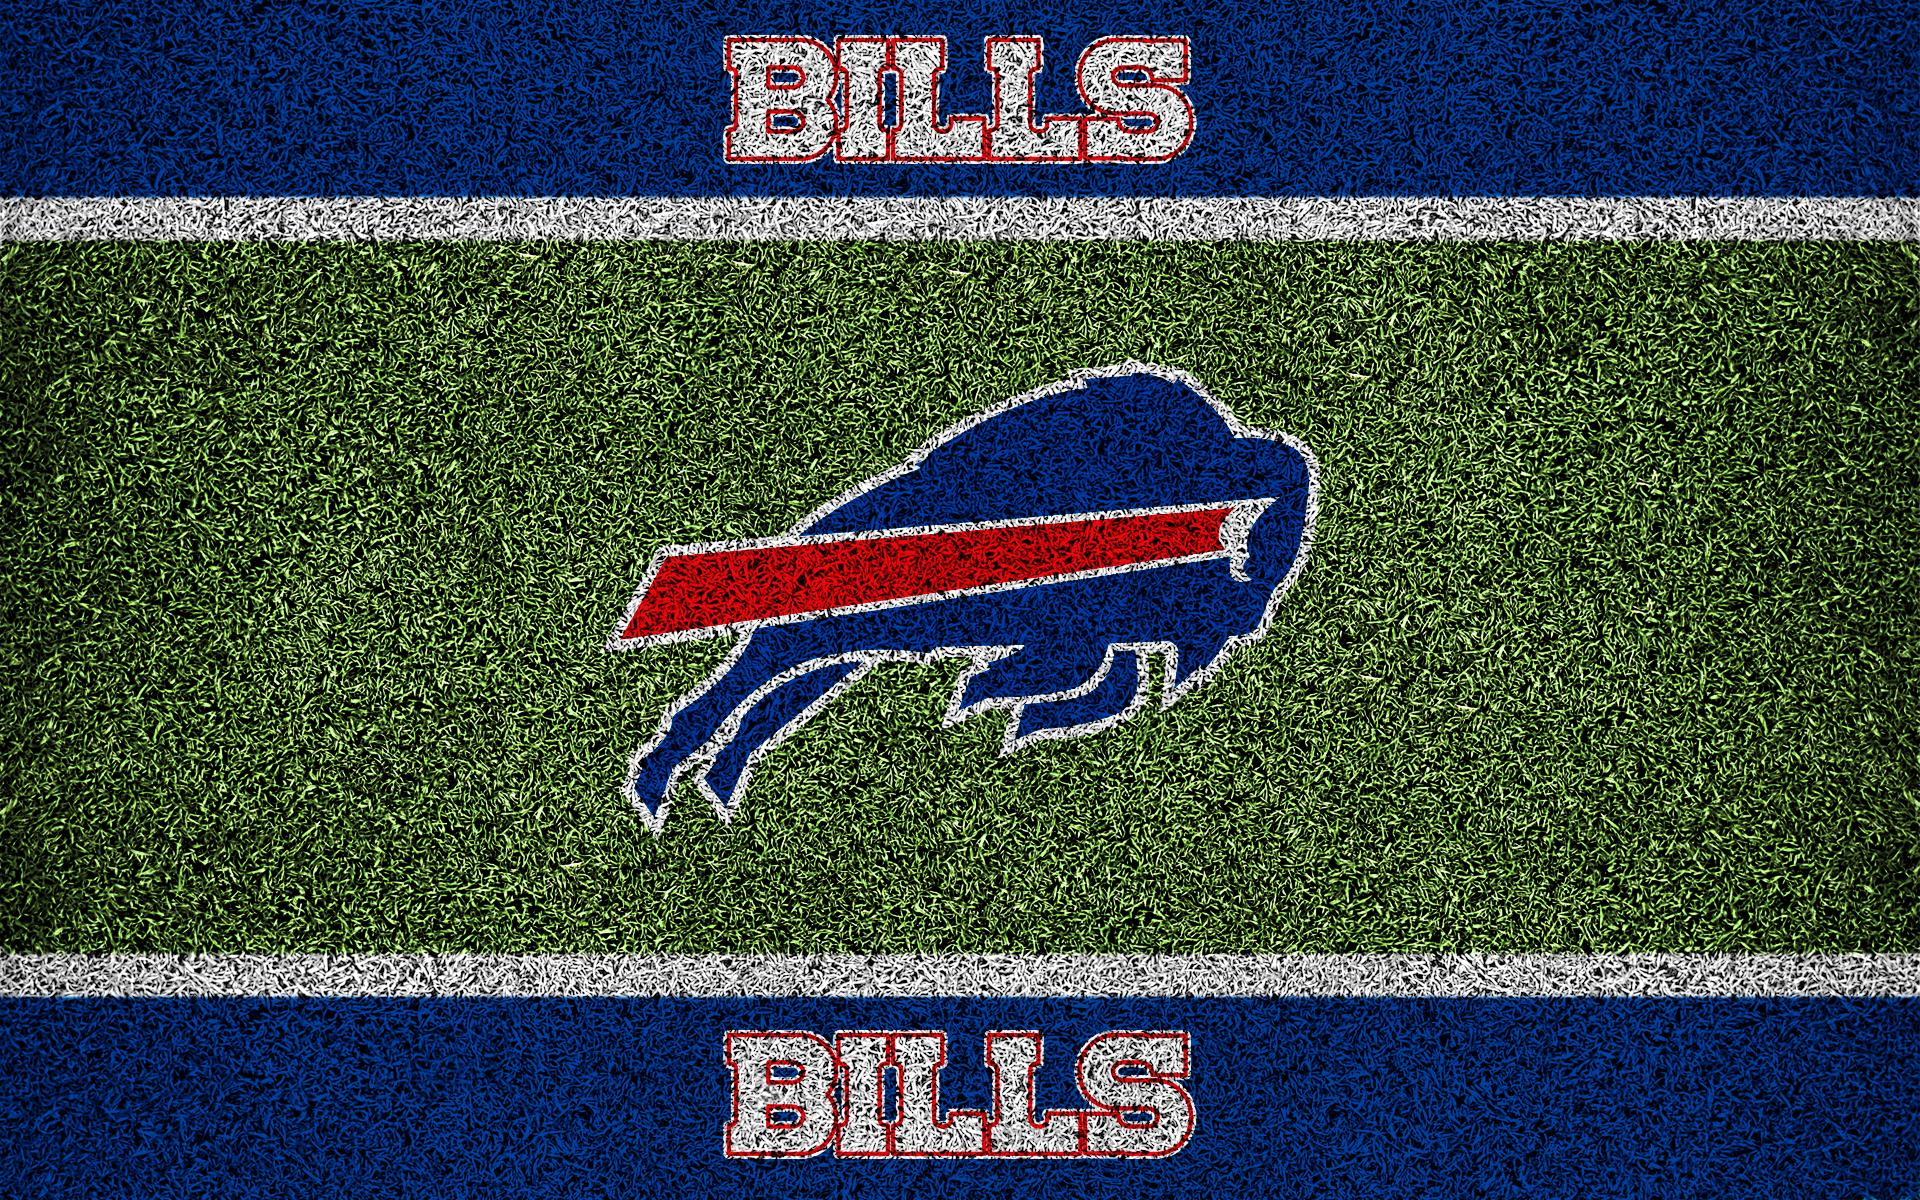 Nice Buffalo Bills wallpaper Buffalo Bills wallpapers 1920x1200